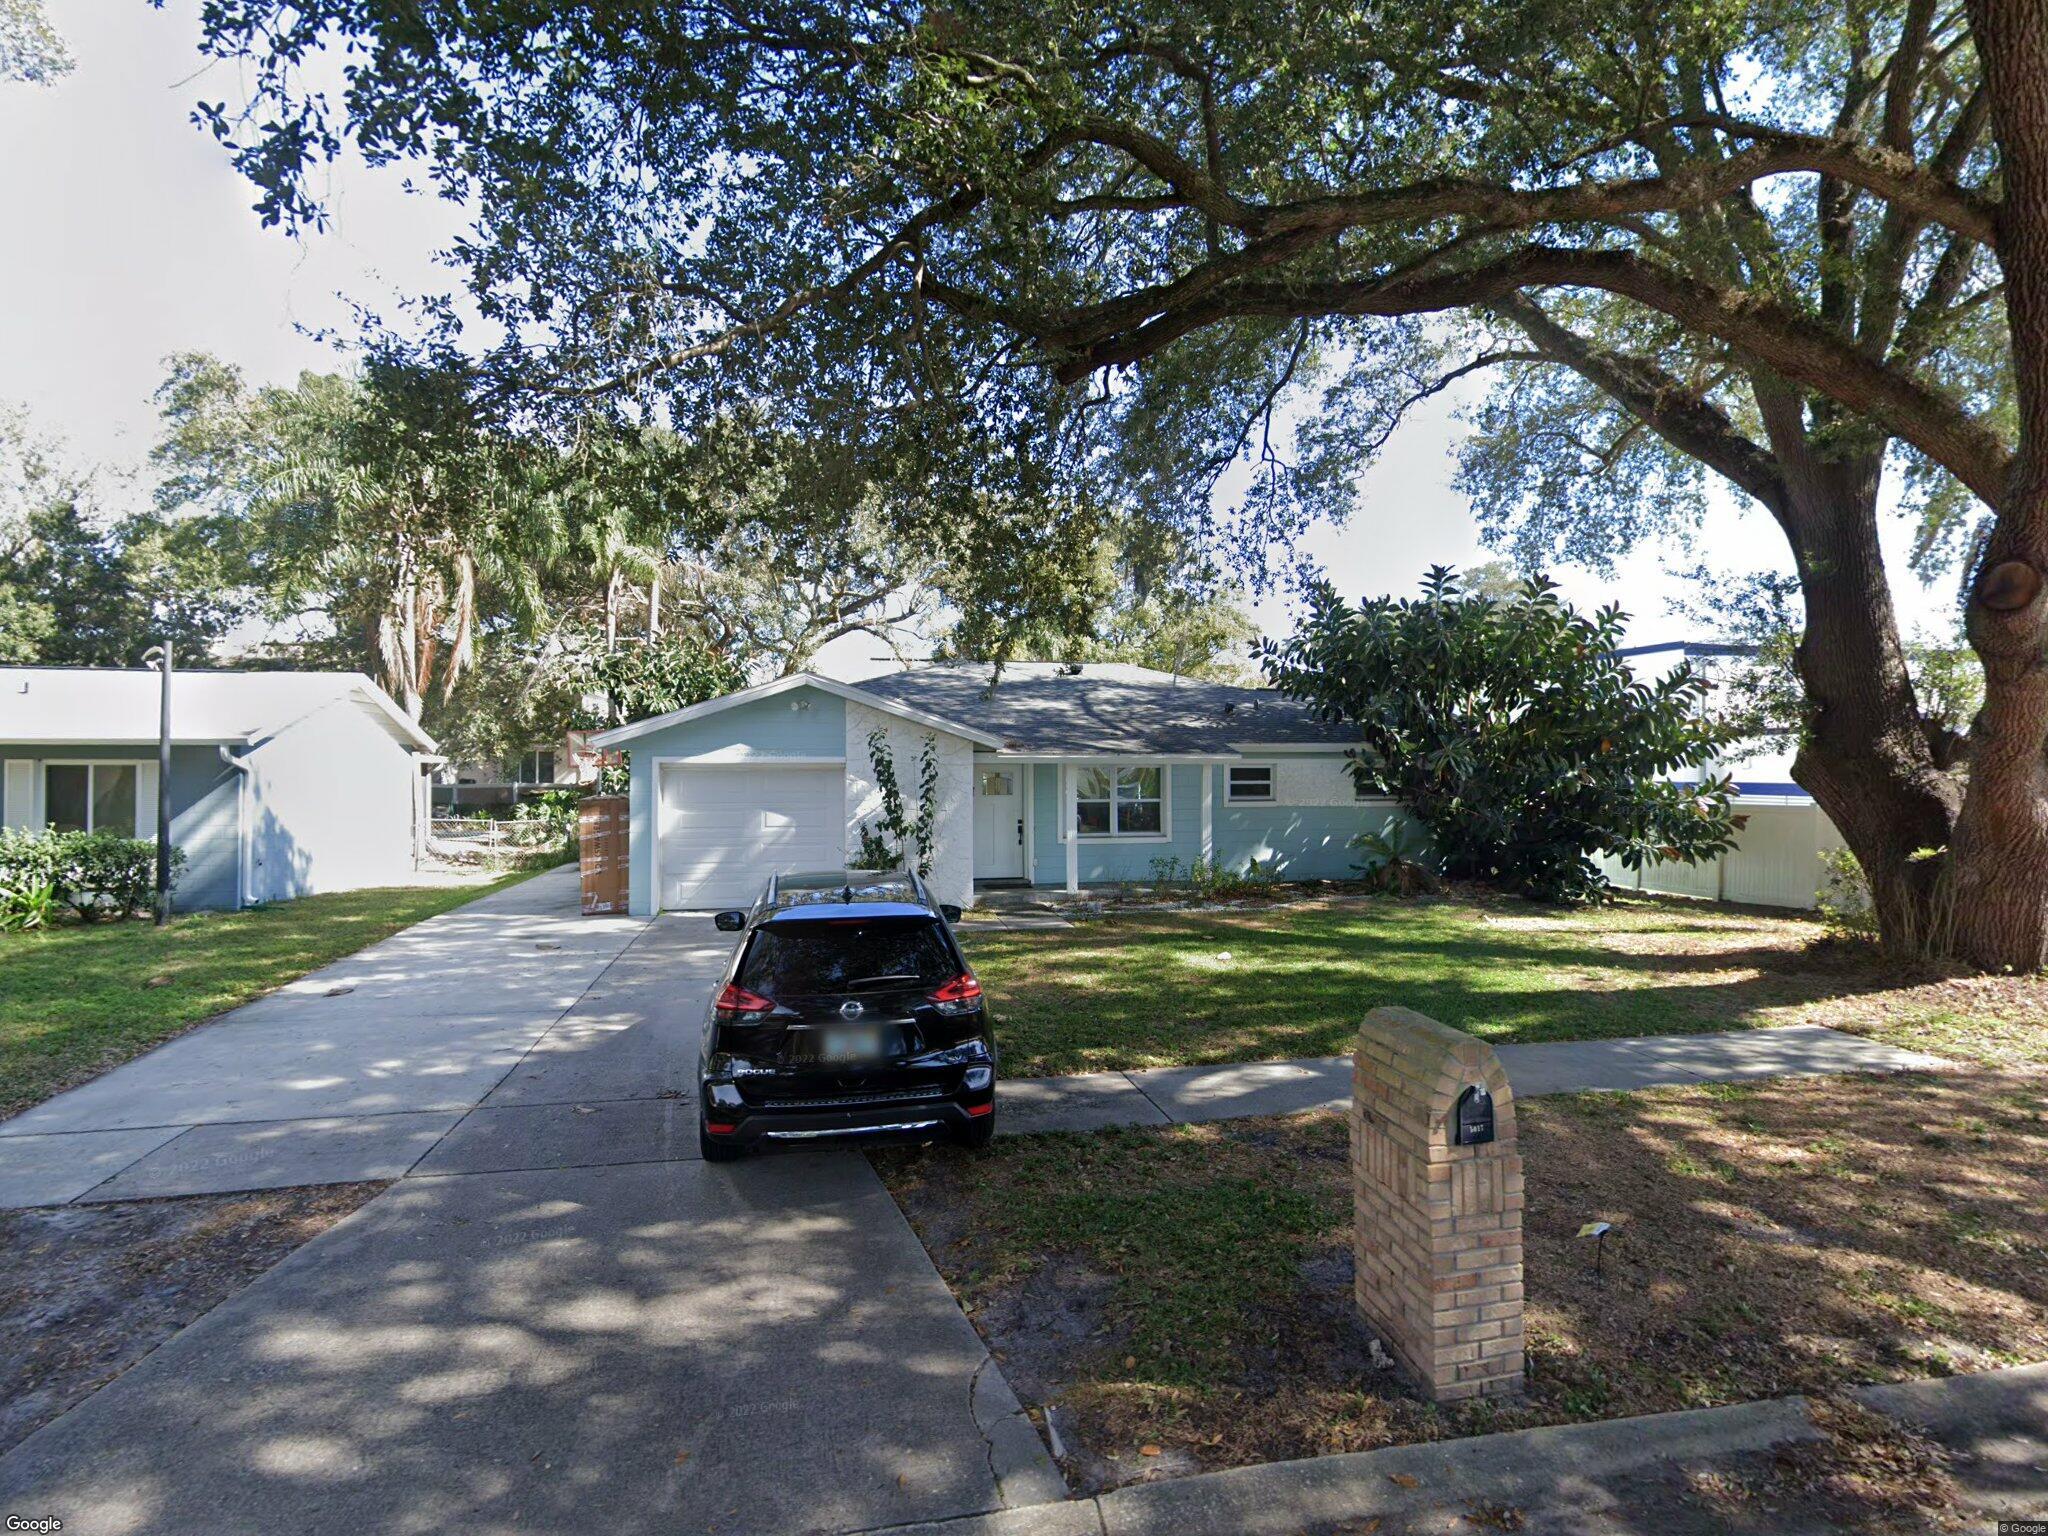 5017 Oak Hill Dr, Winter Park, FL 32792 - Foreclosure   Trulia